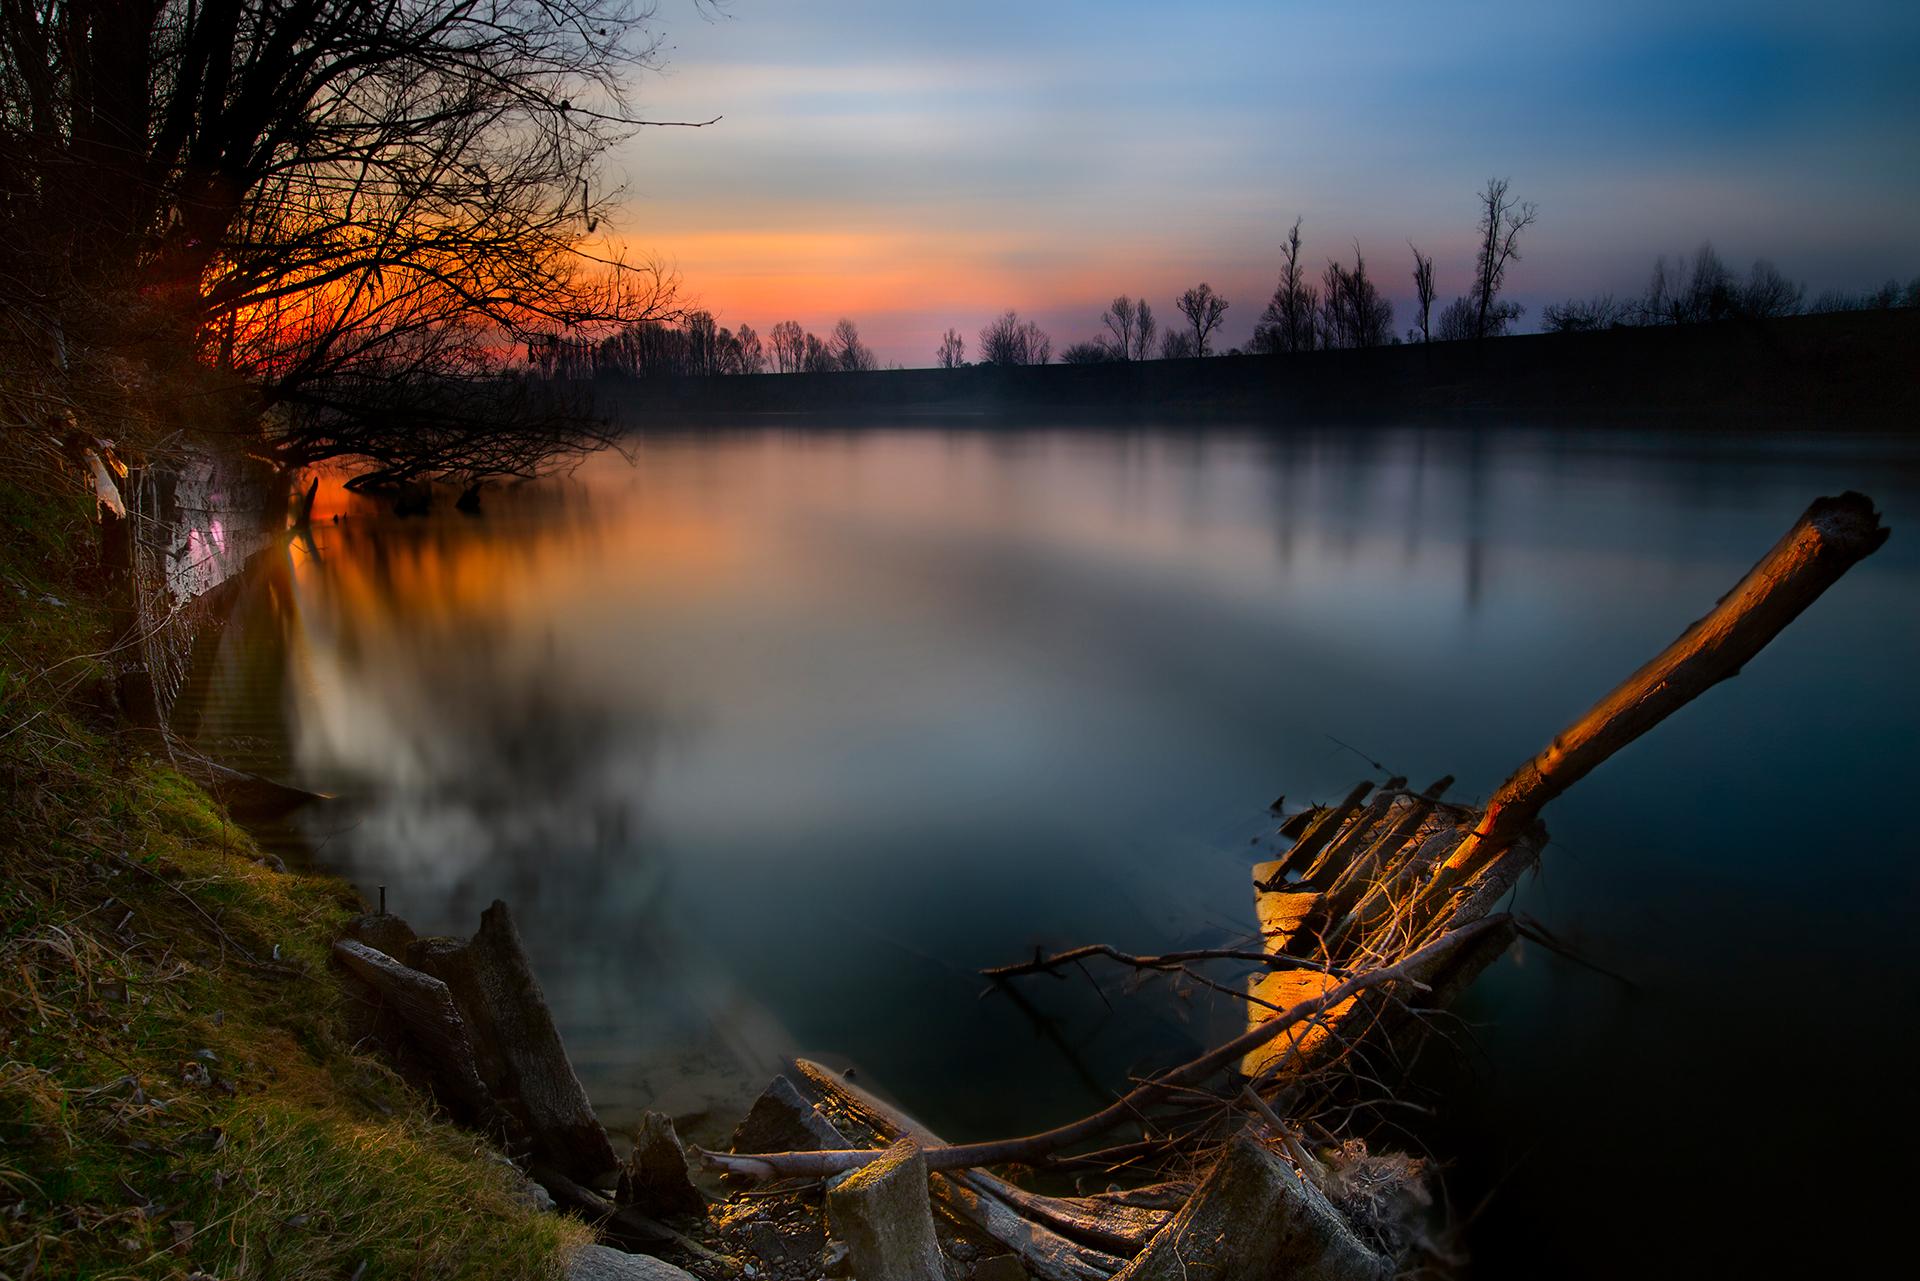 Sunrise on the river...